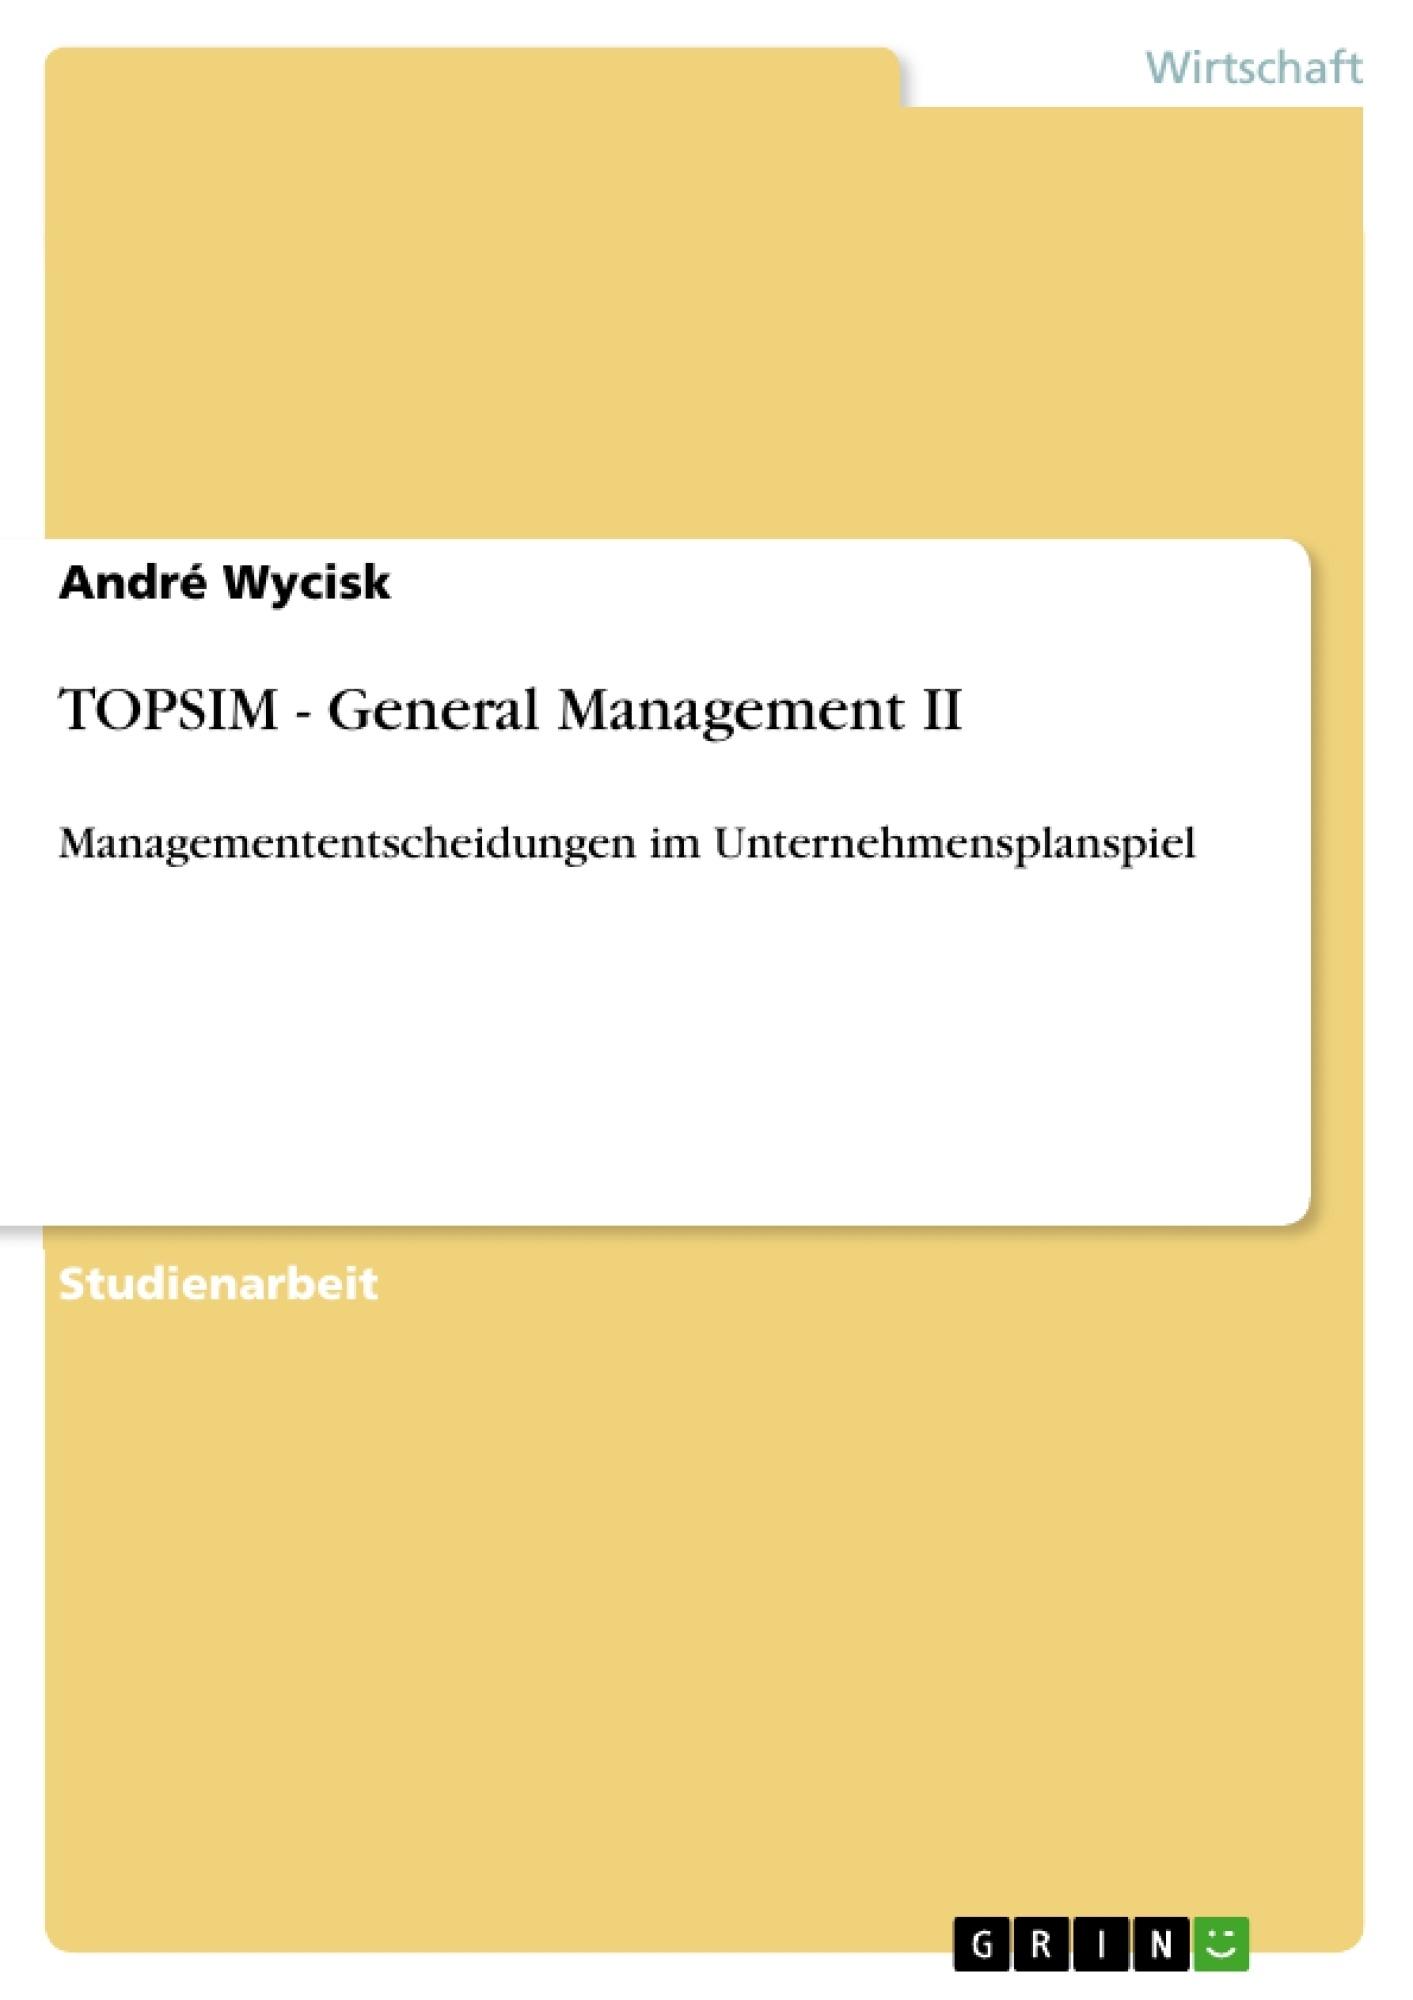 Titel: TOPSIM - General Management II